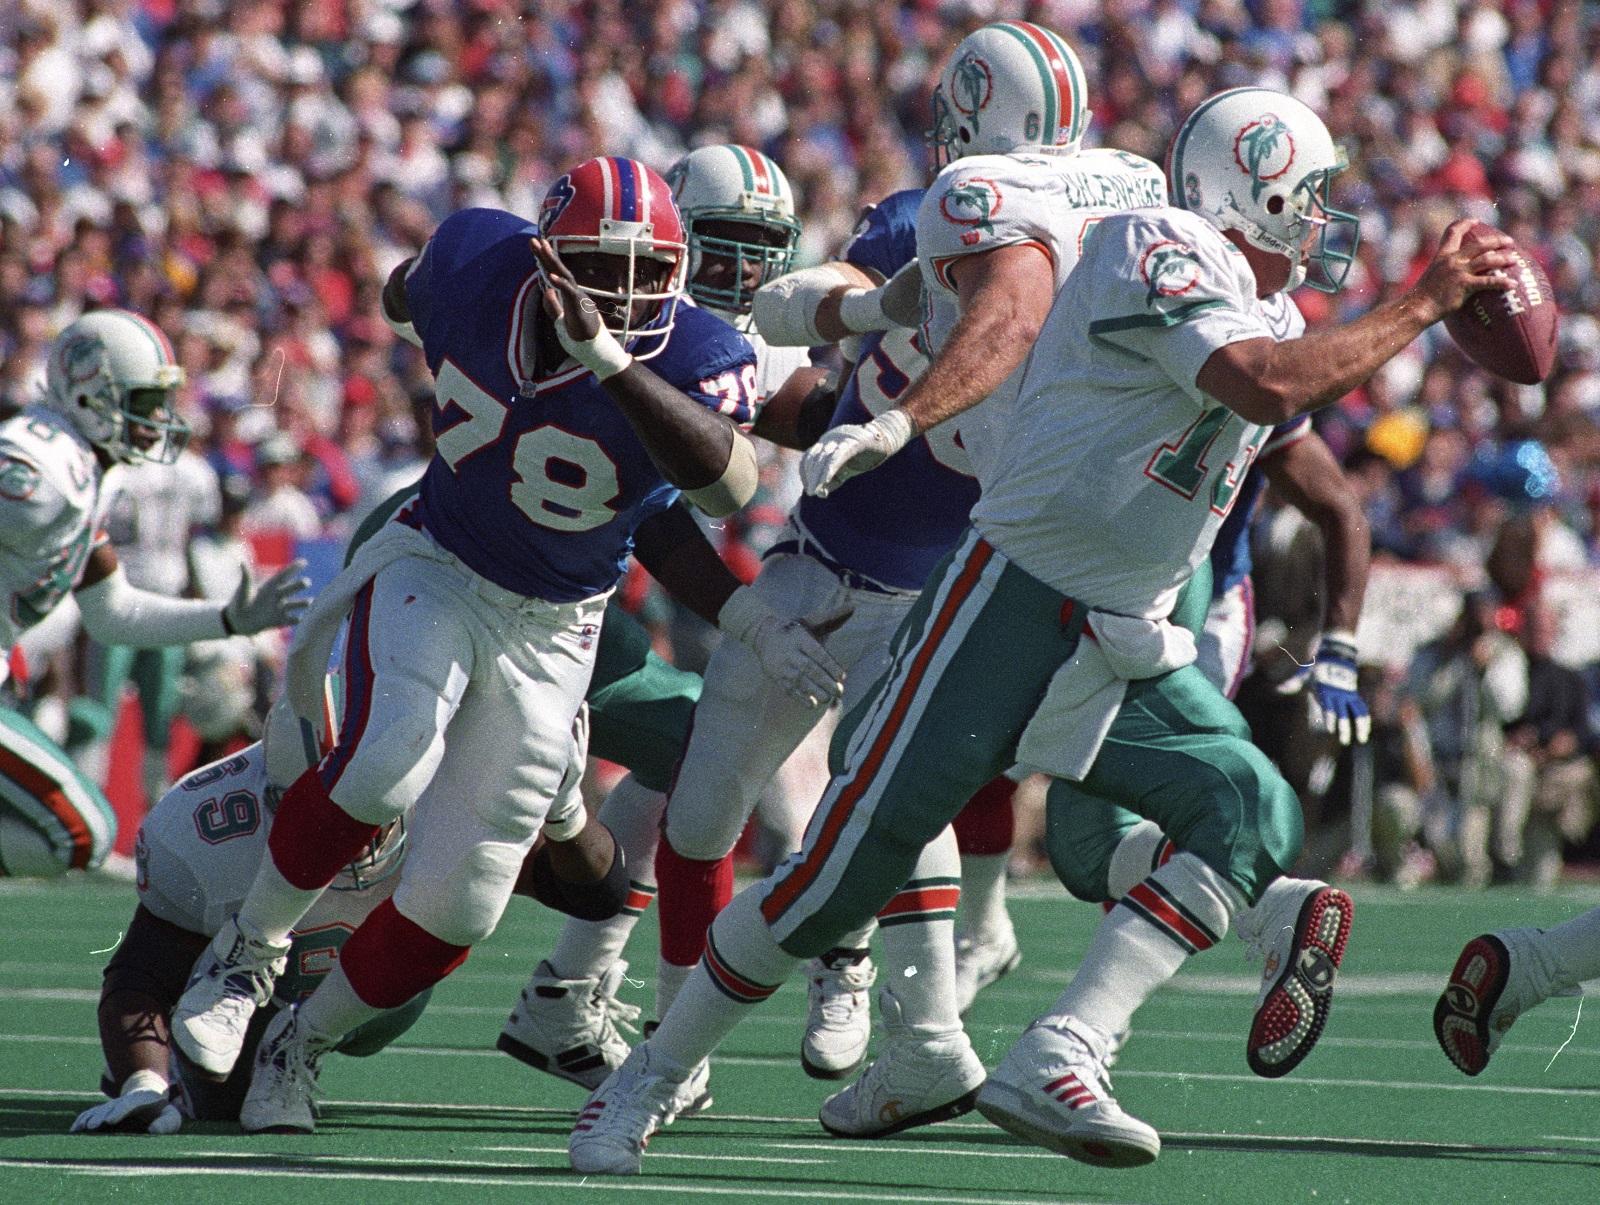 Buffalo Bills defensive end Bruce Smith pursues Dolphins quarterback Dan Marino. (Buffalo News file photo)